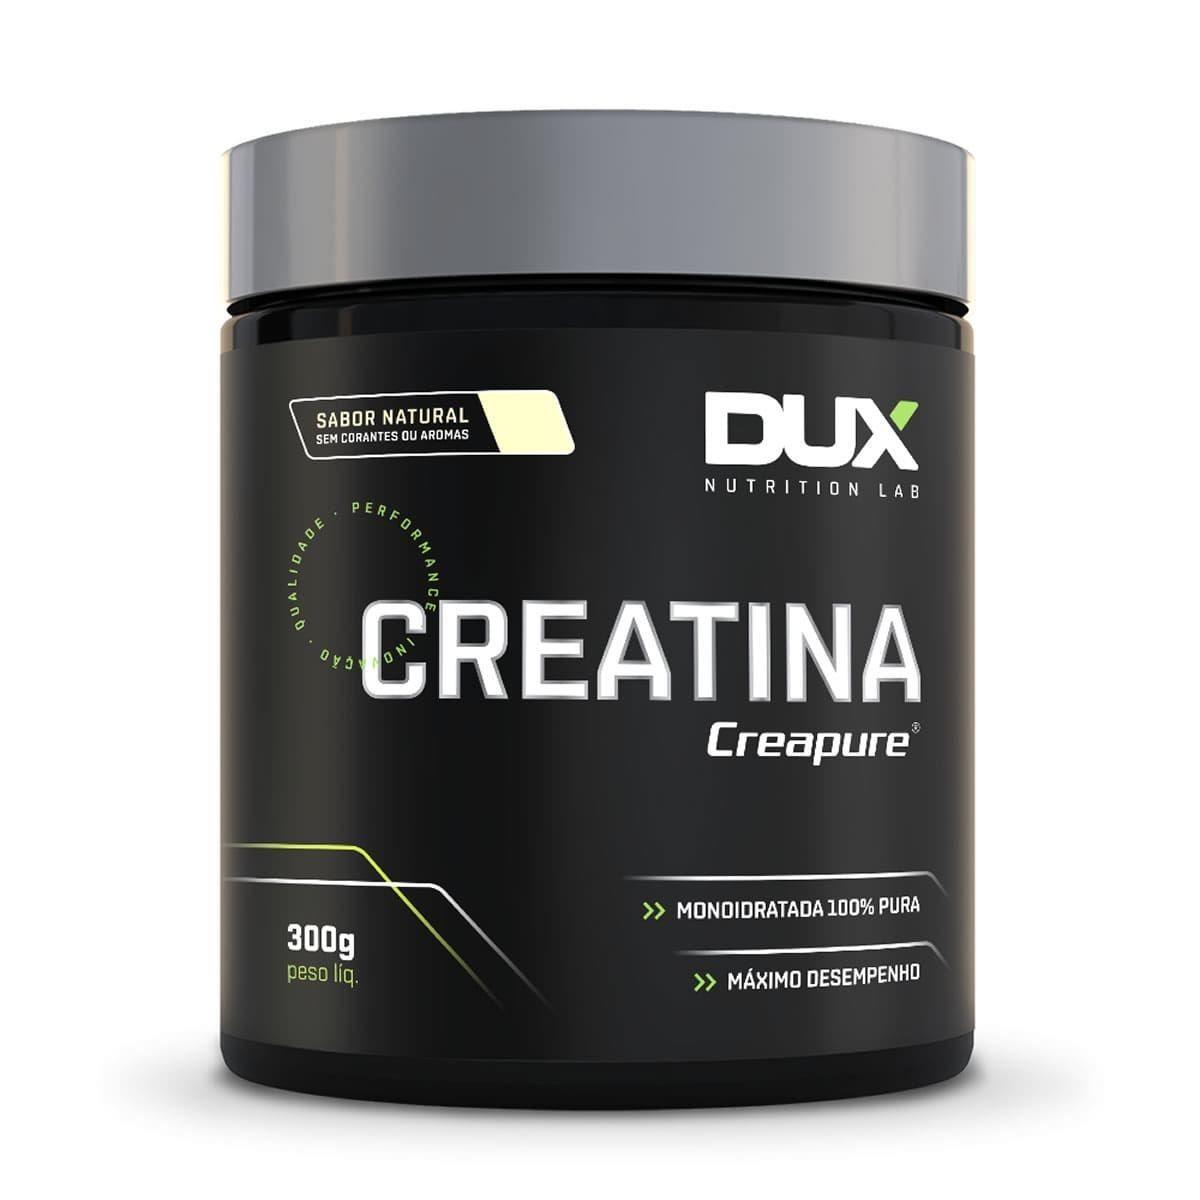 Creatina (100% Creapure®) Dux - 300g